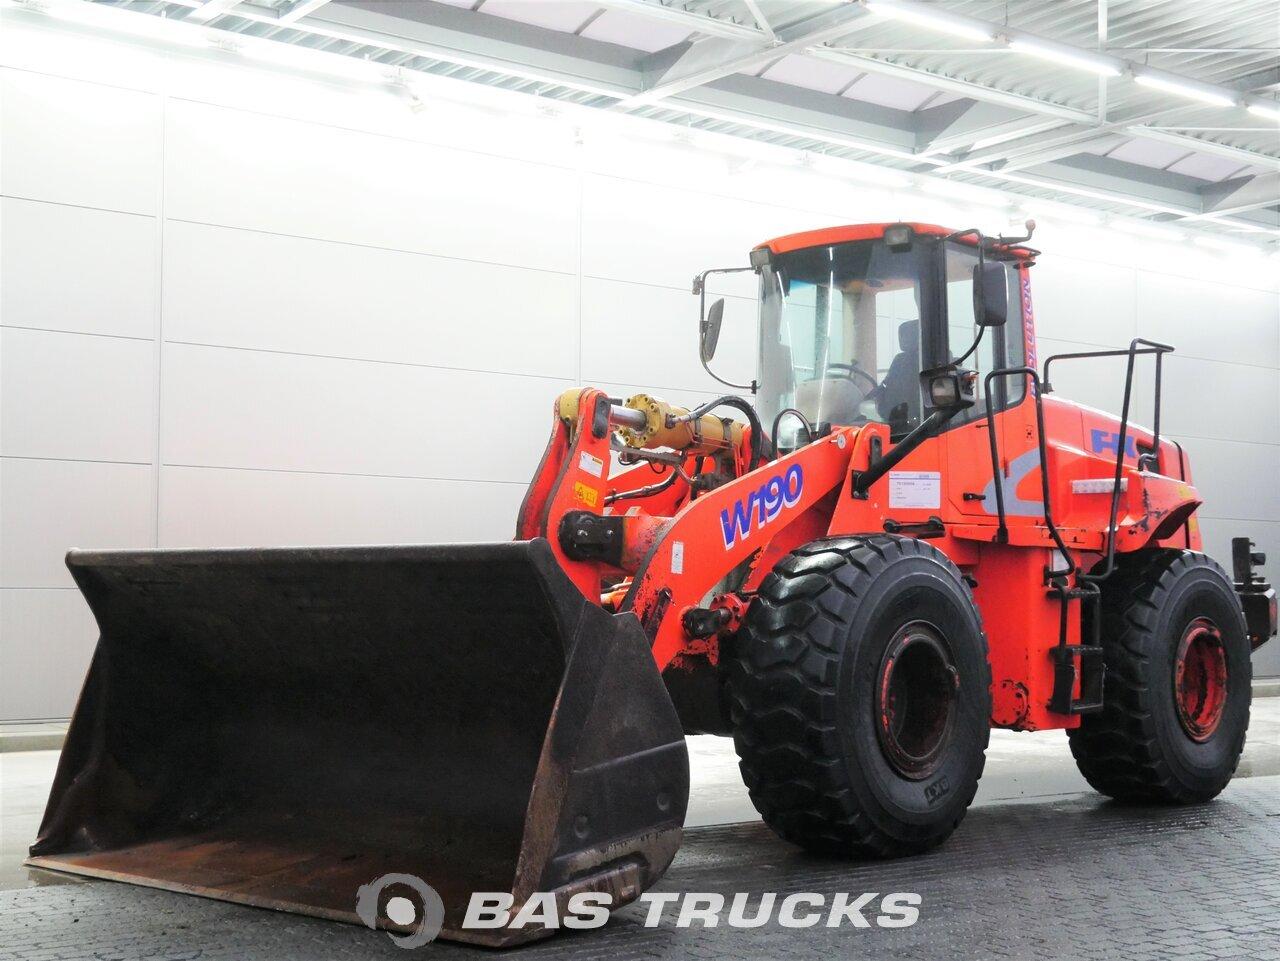 For sale at BAS Machinery: FIAT Kobelco W190 4X4 01/2005